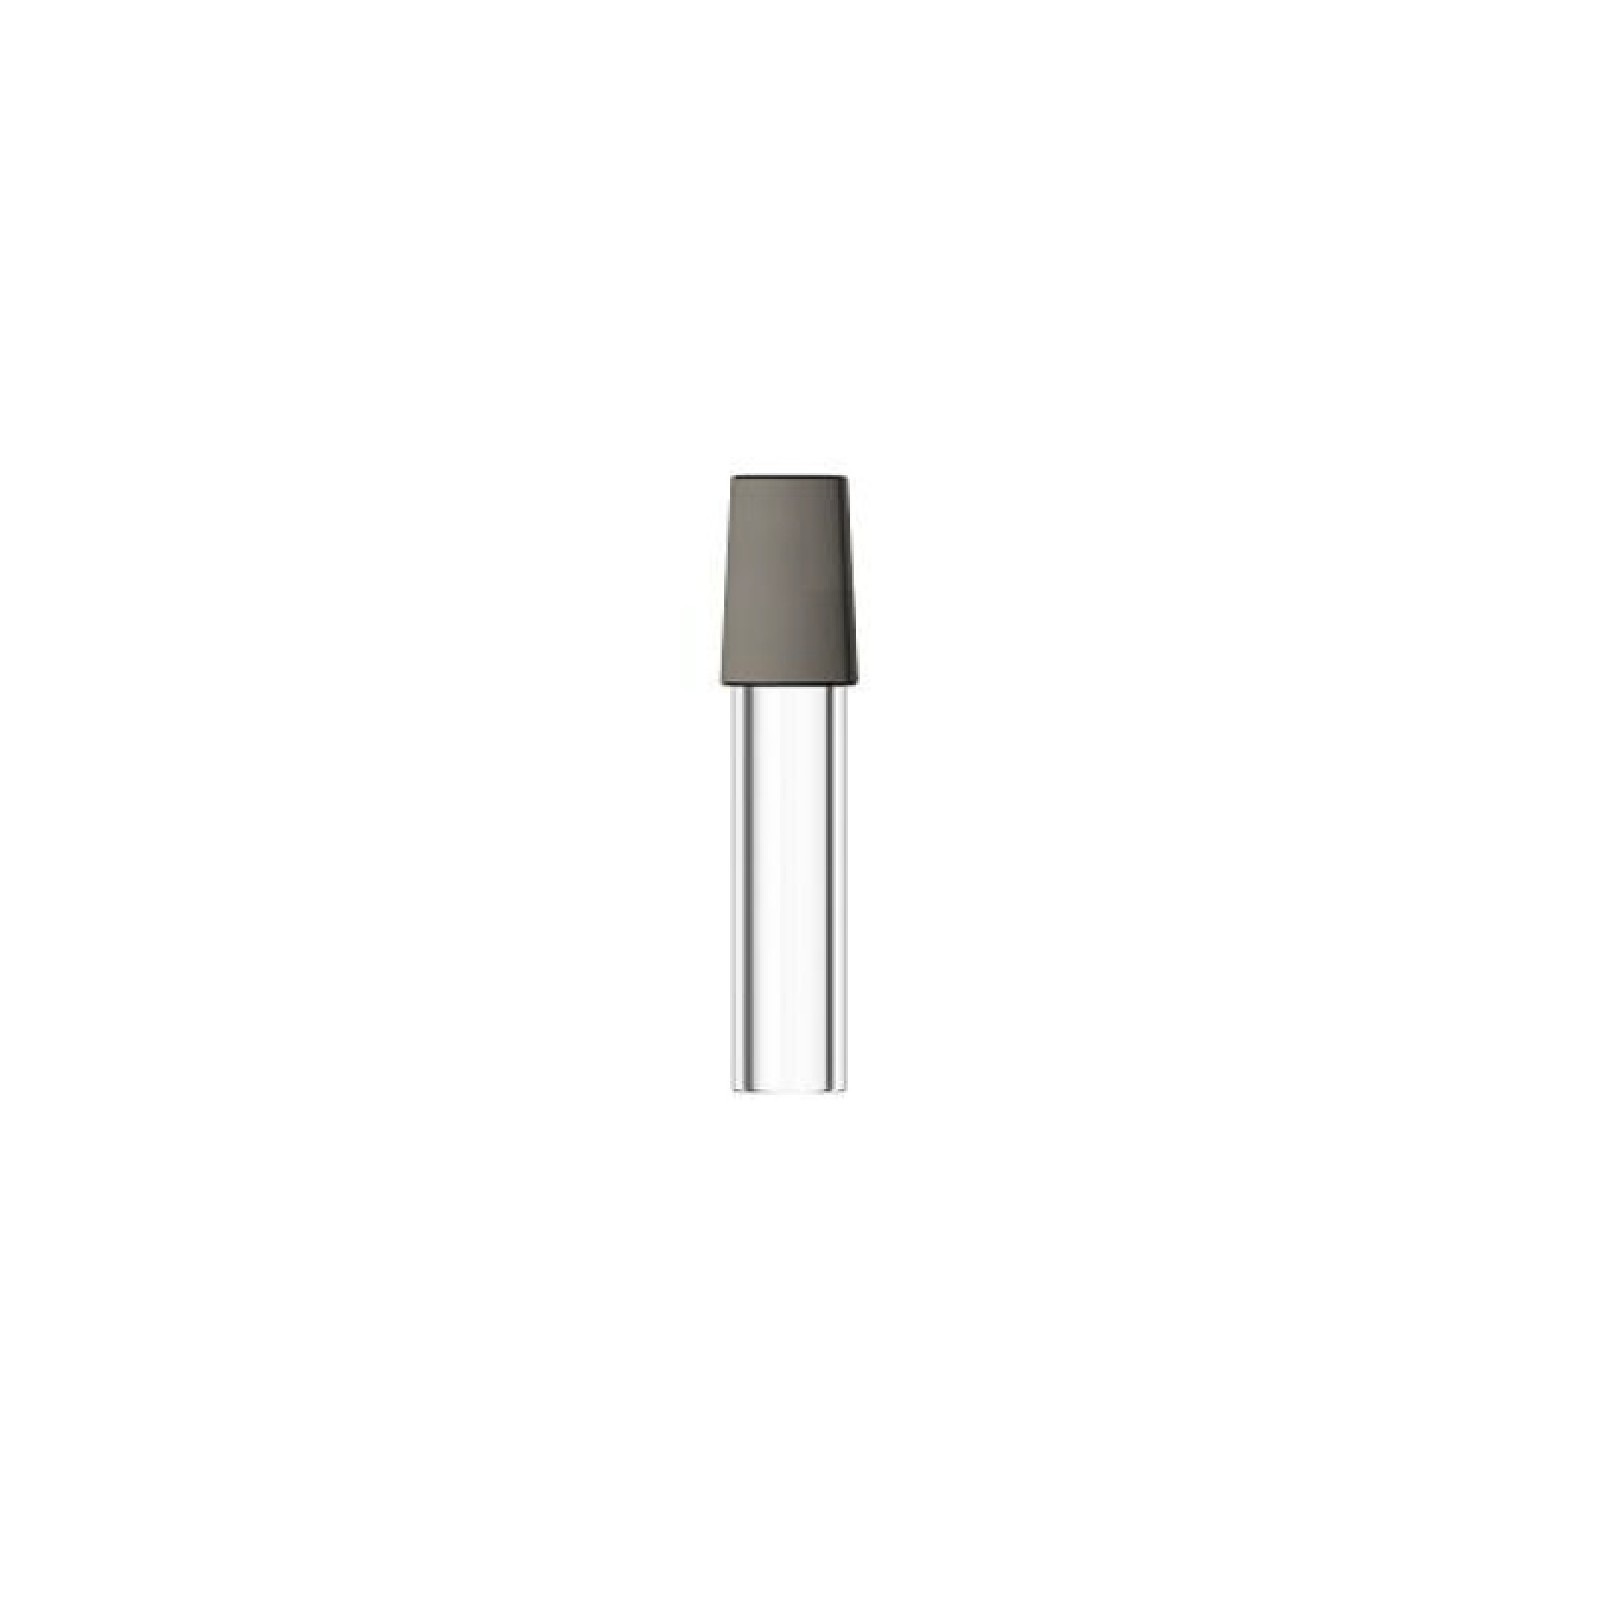 14mm WPA pour vapcap Dynavap (75mm) DynaVap - 1